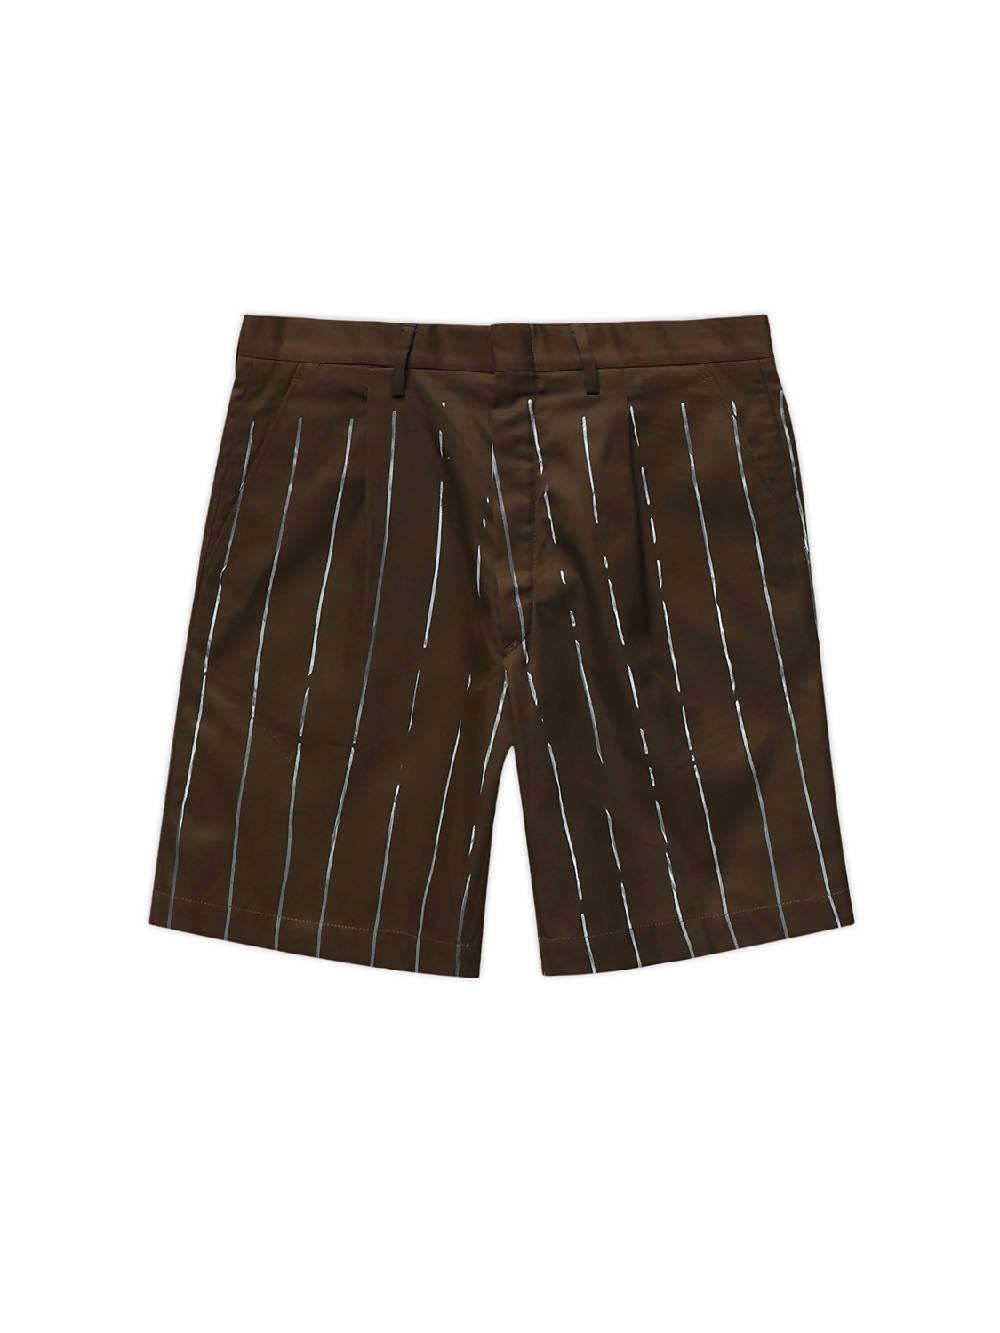 MYAR Khaki ITSRT90 Striped Shorts